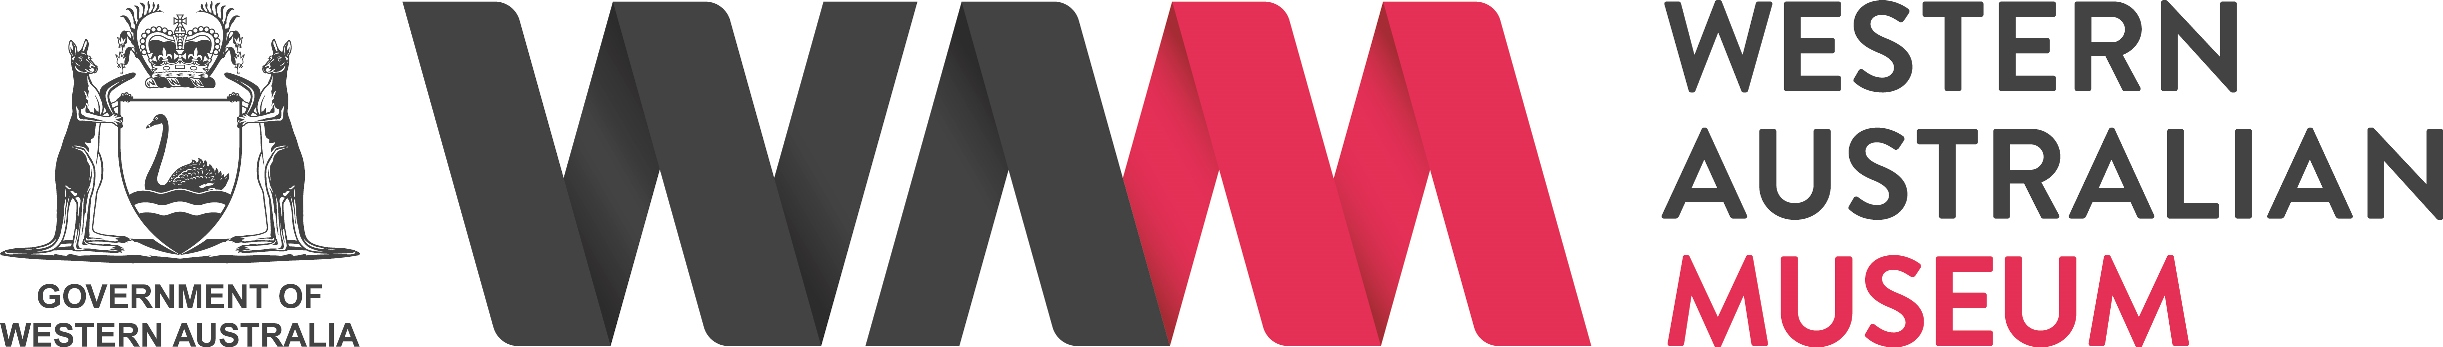 WA Museum logo